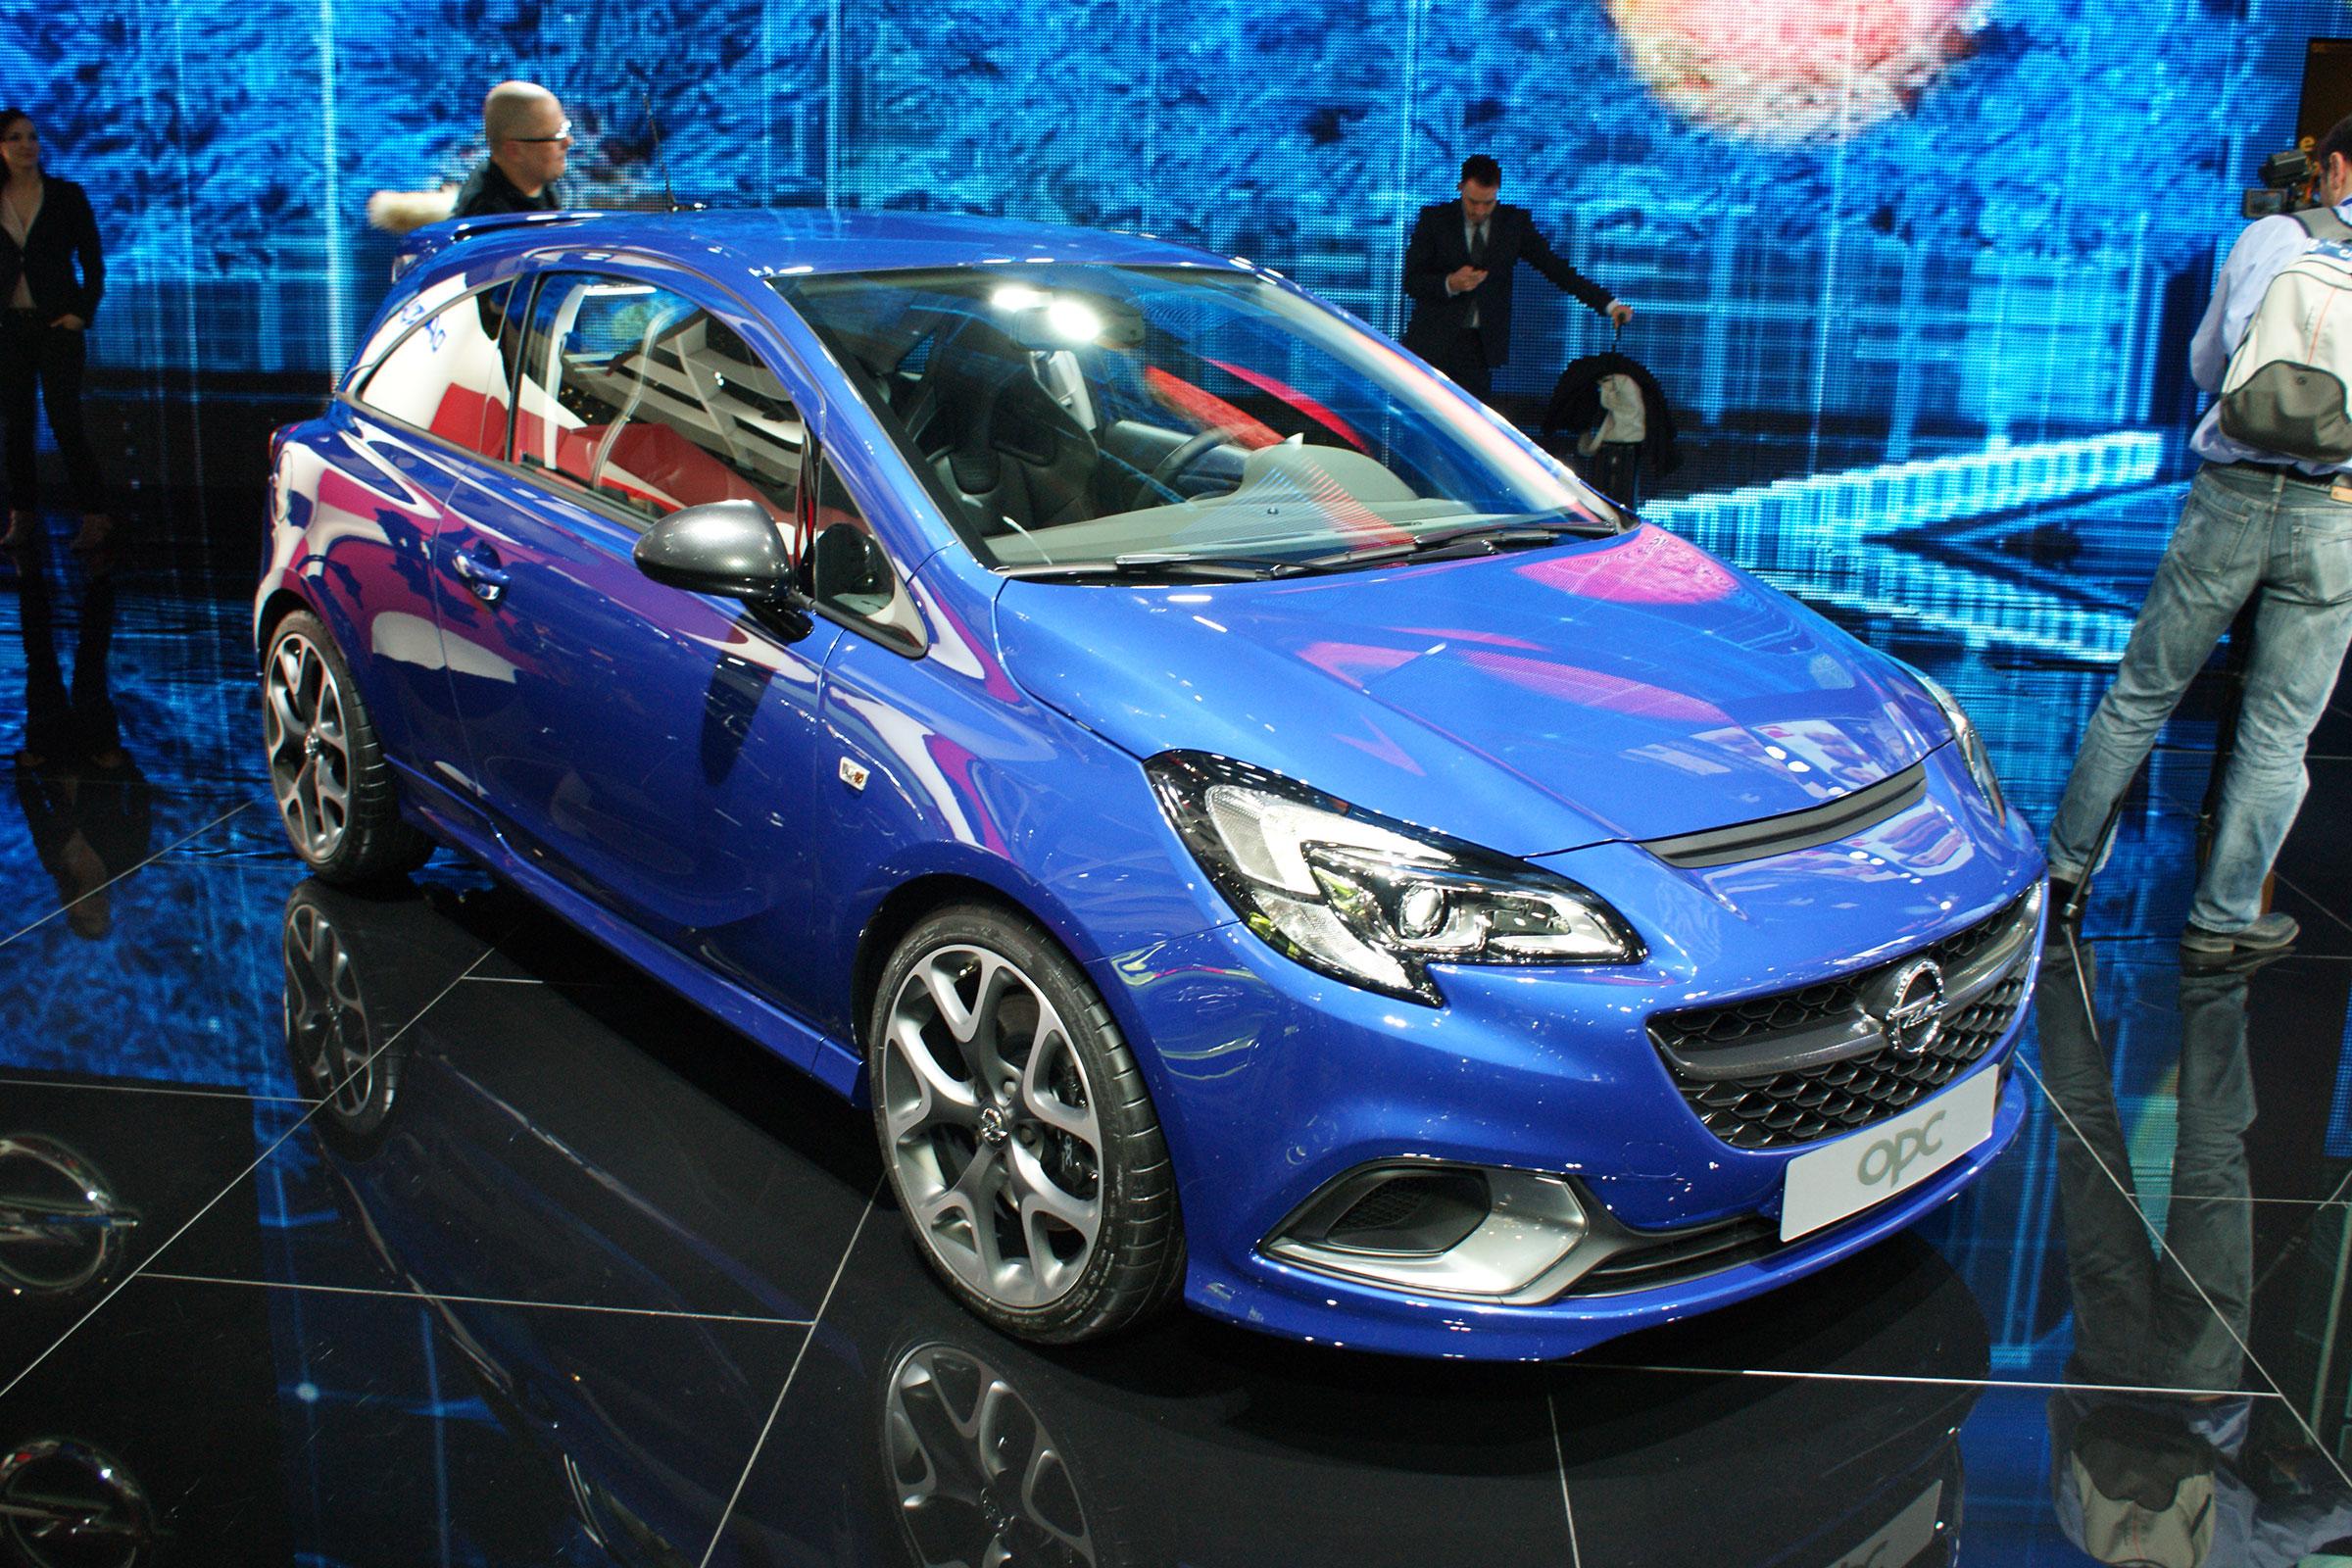 2021 Vauxhall Corsa VXR Pictures